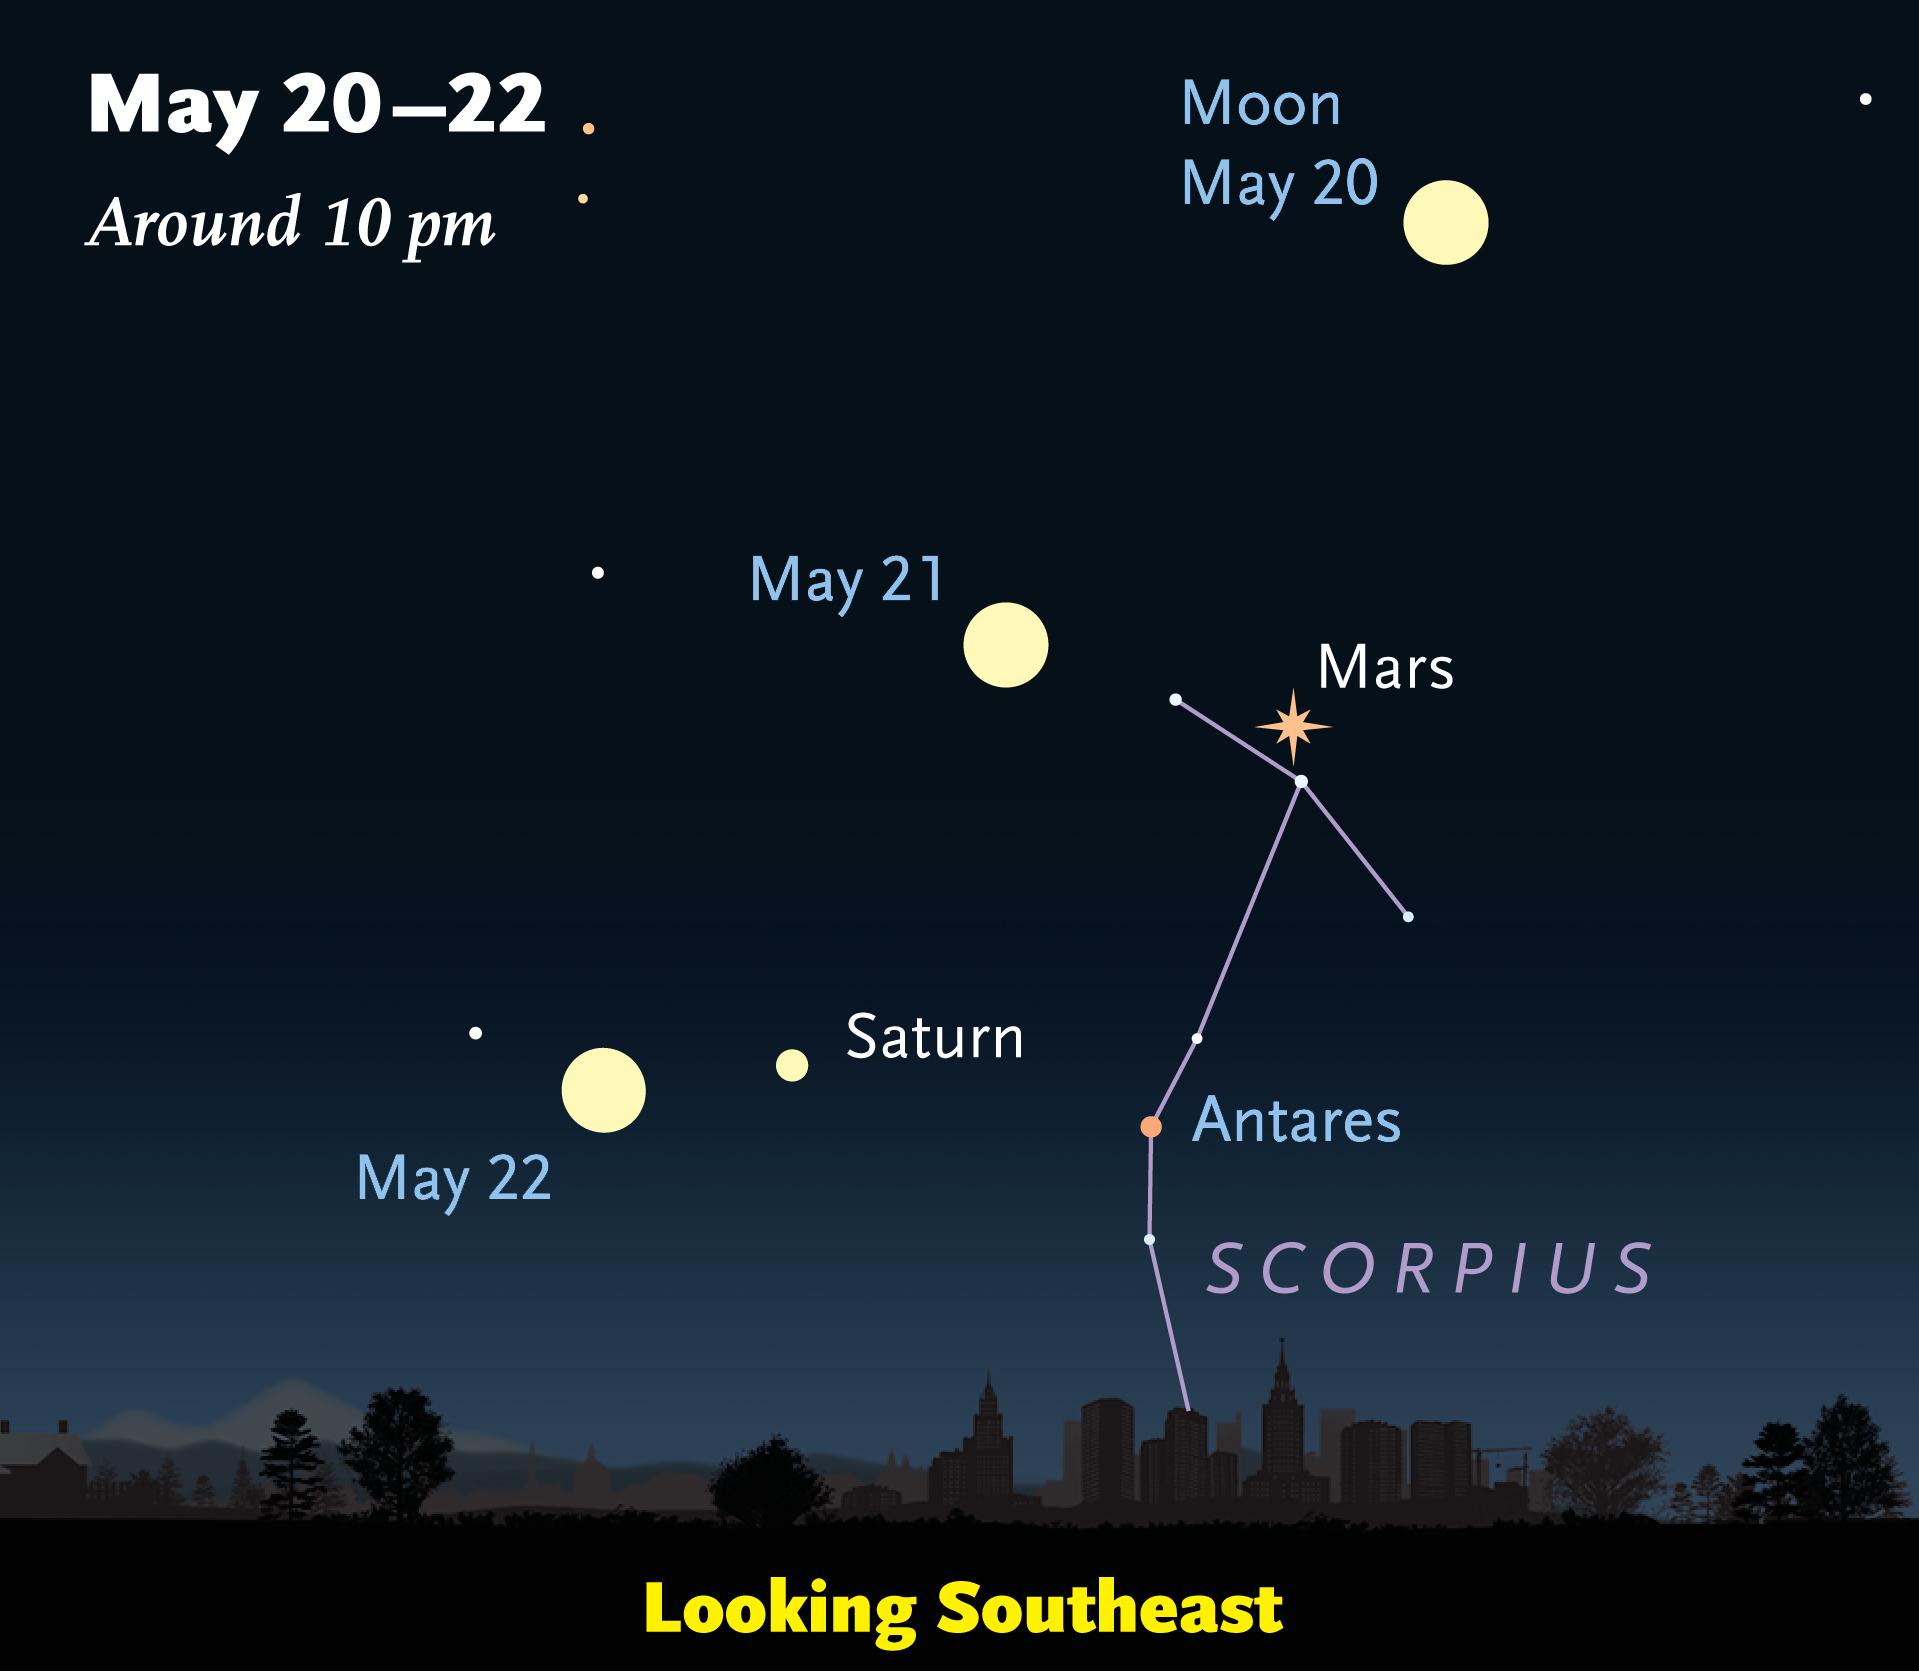 Mars and company on May 20-22, 2016